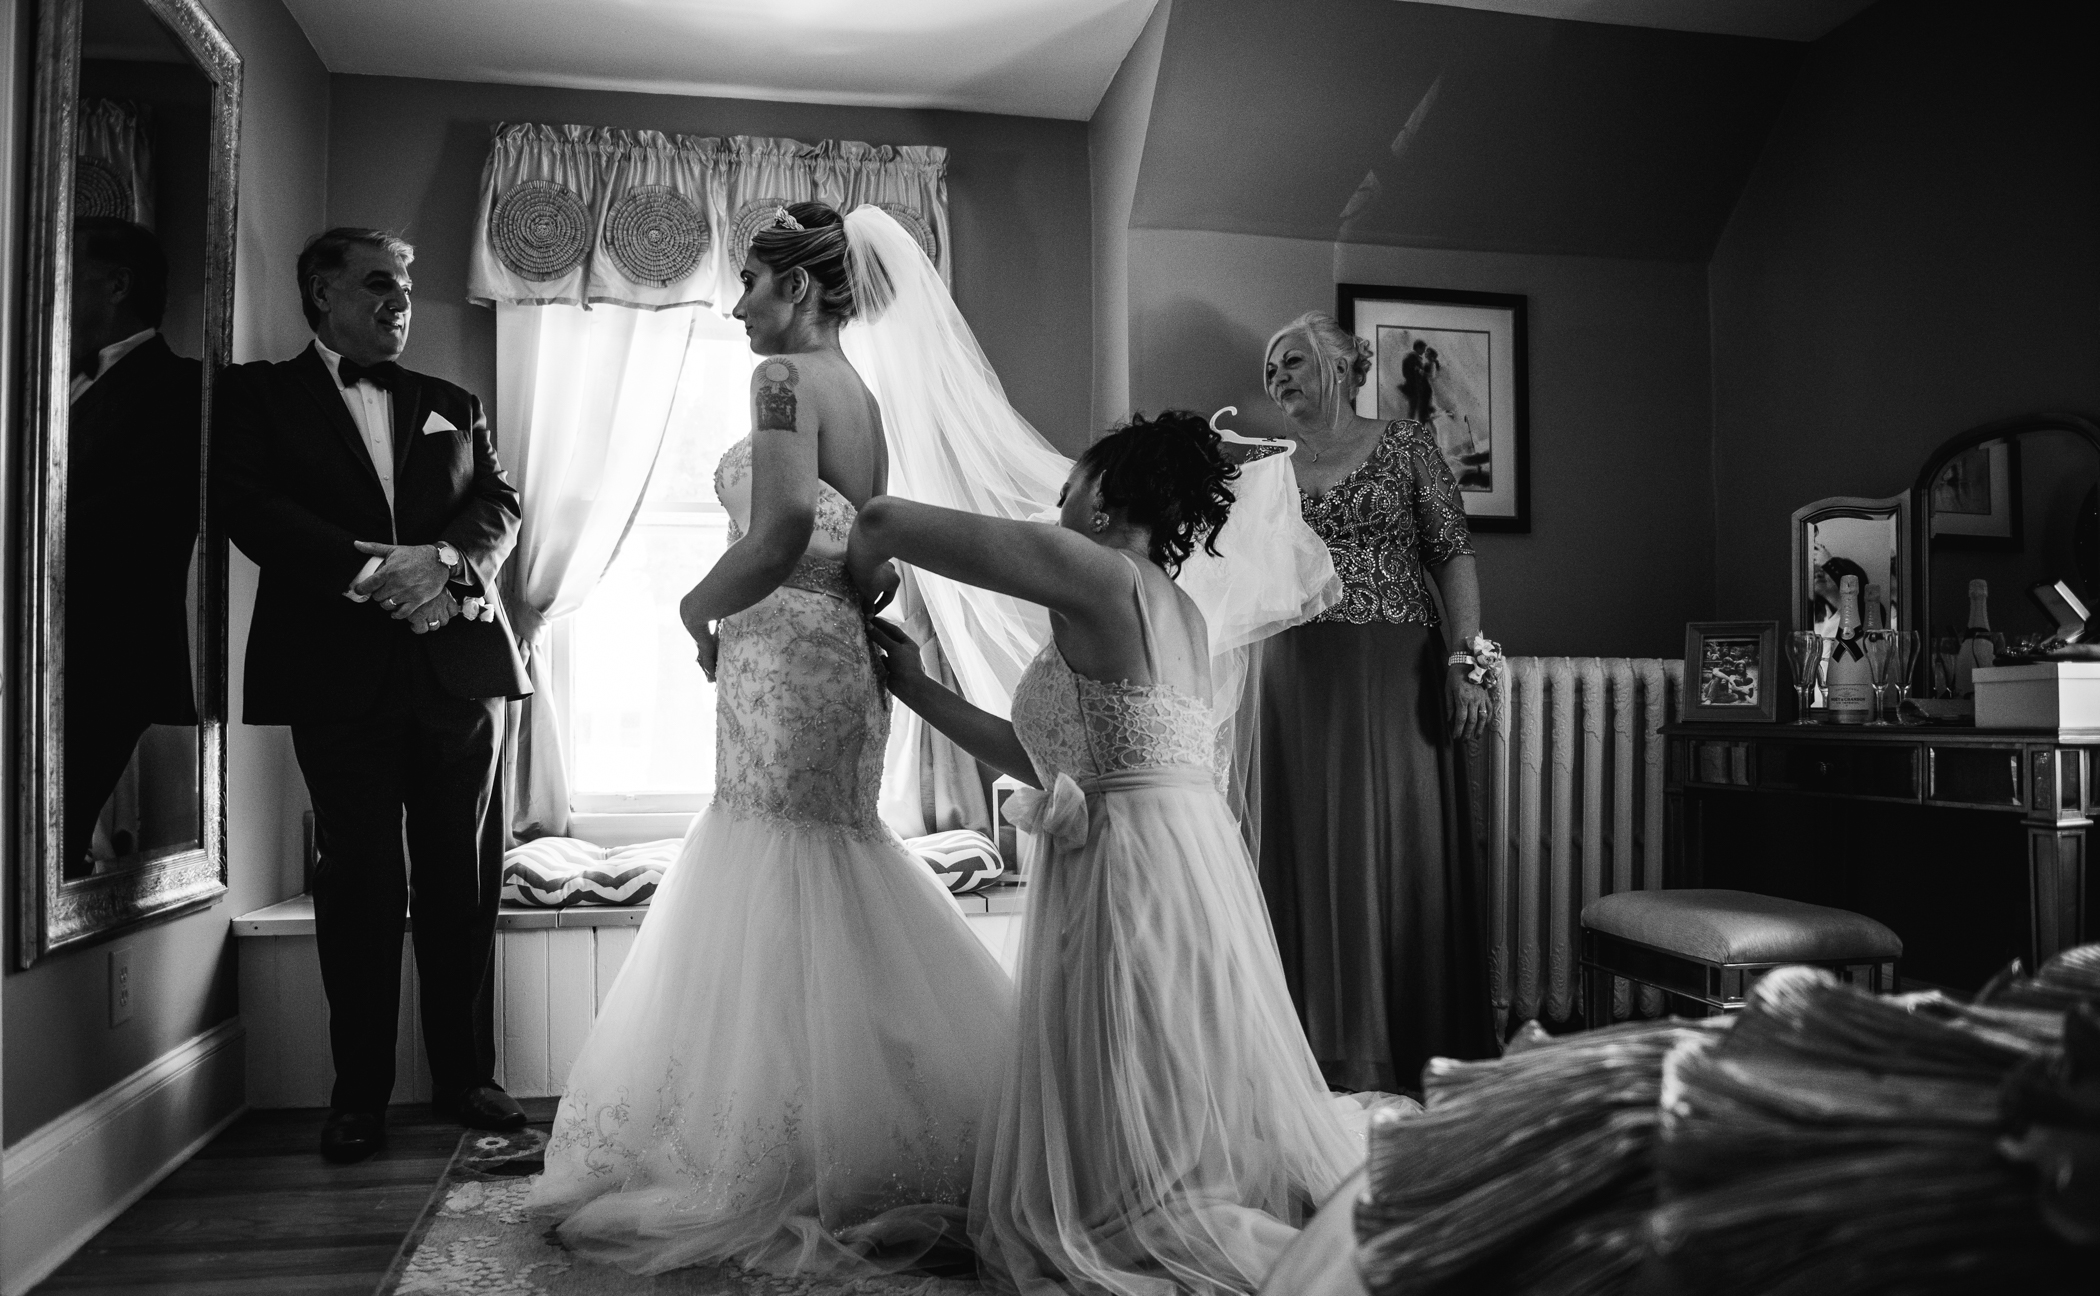 connecticut-wedding-photographers-chris-nachtwey-photography-2018-31.jpg